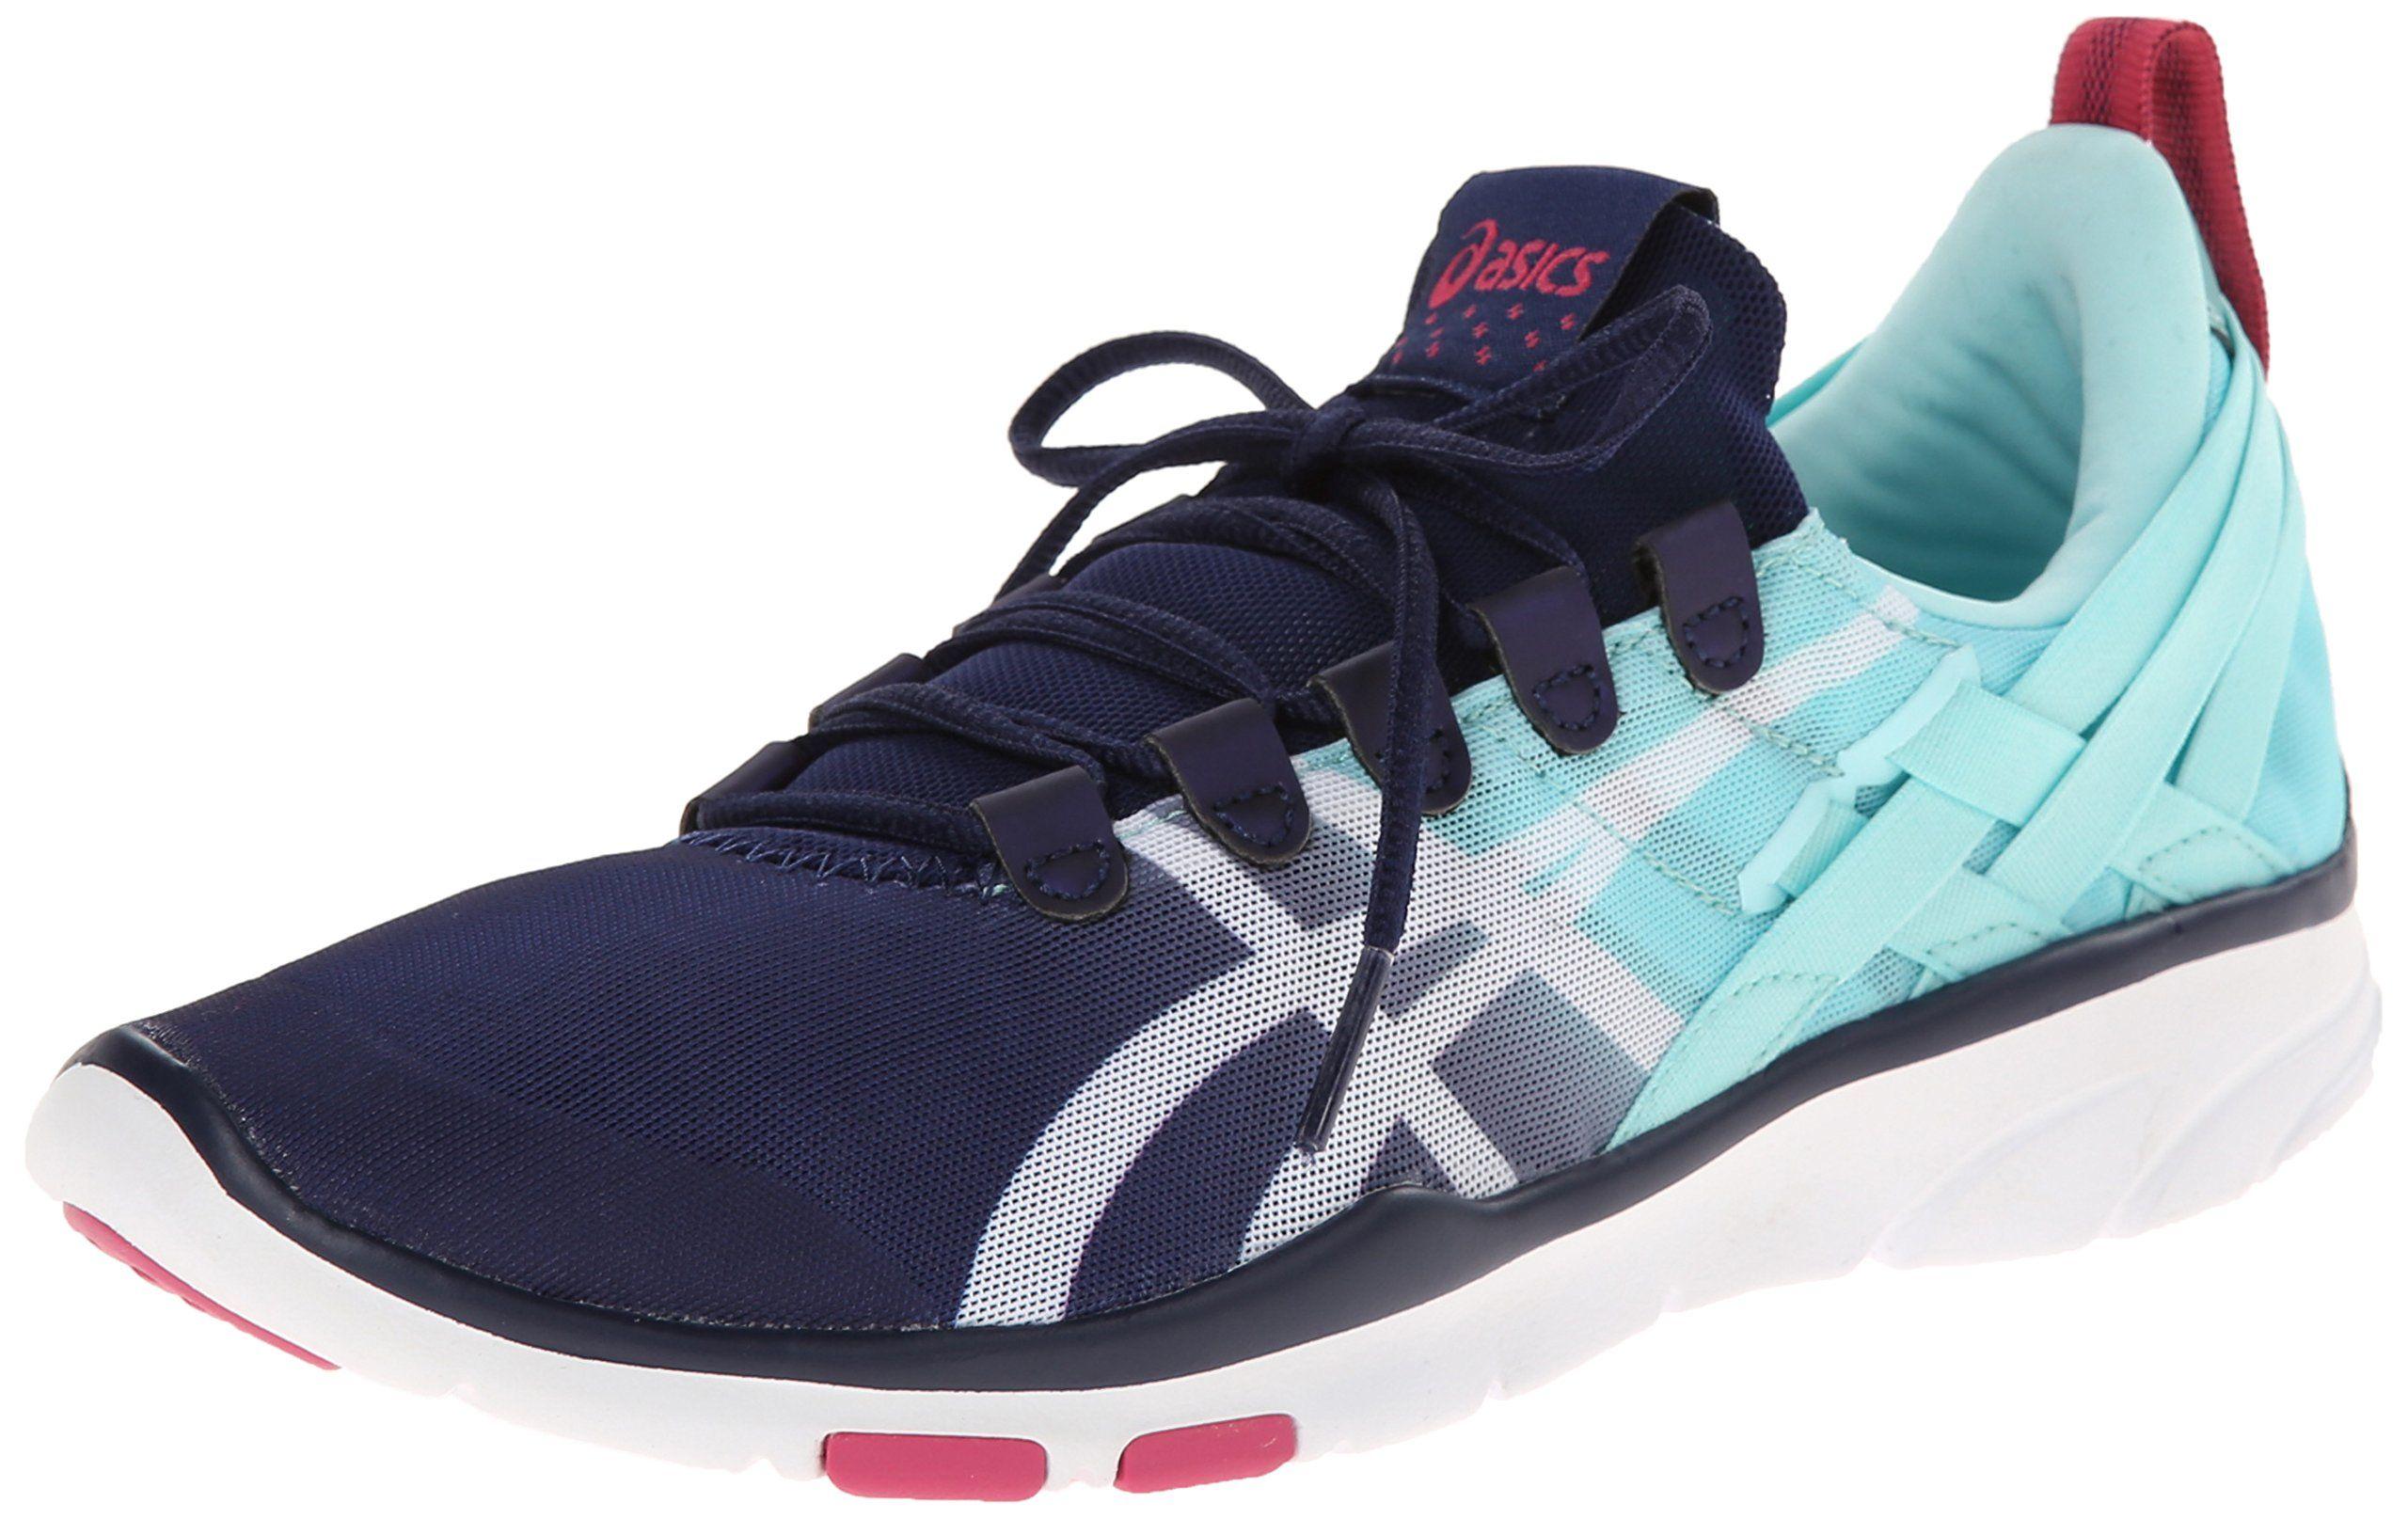 asics shoes zumba shoes 2019